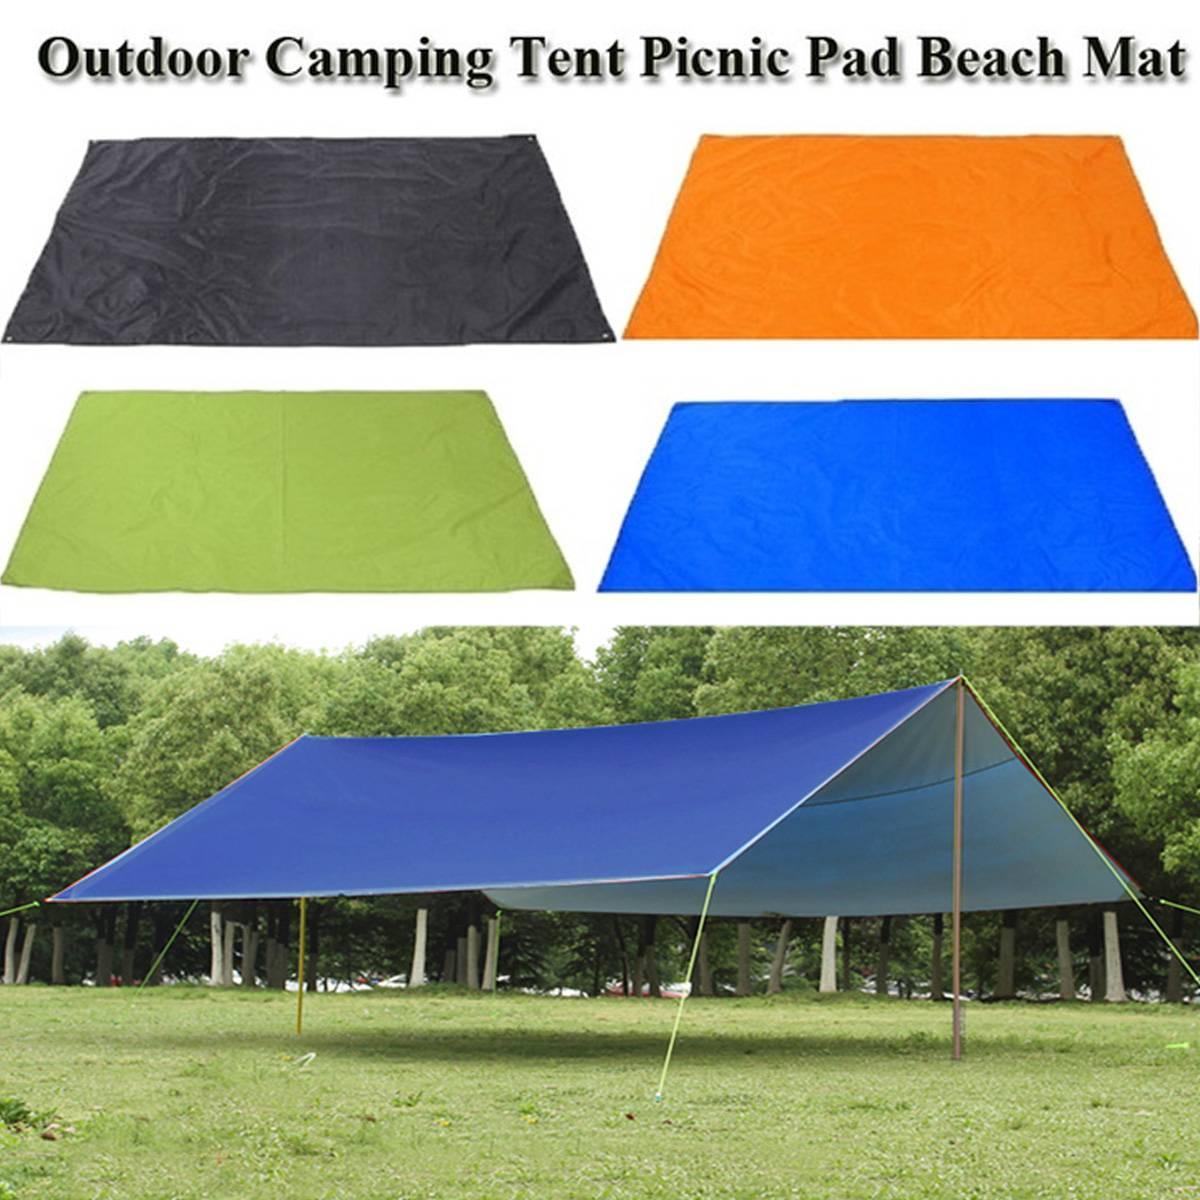 Us $8.5 15% Off|Beach Sun Shelter Tarp Waterproof Tent Shade Ultralight Uv  Garden Awning Canopy Sunshade Outdoor Camping Hammock Rain Fly|Sun Shelter|  ... serapportantà Abri De Jardin Super U